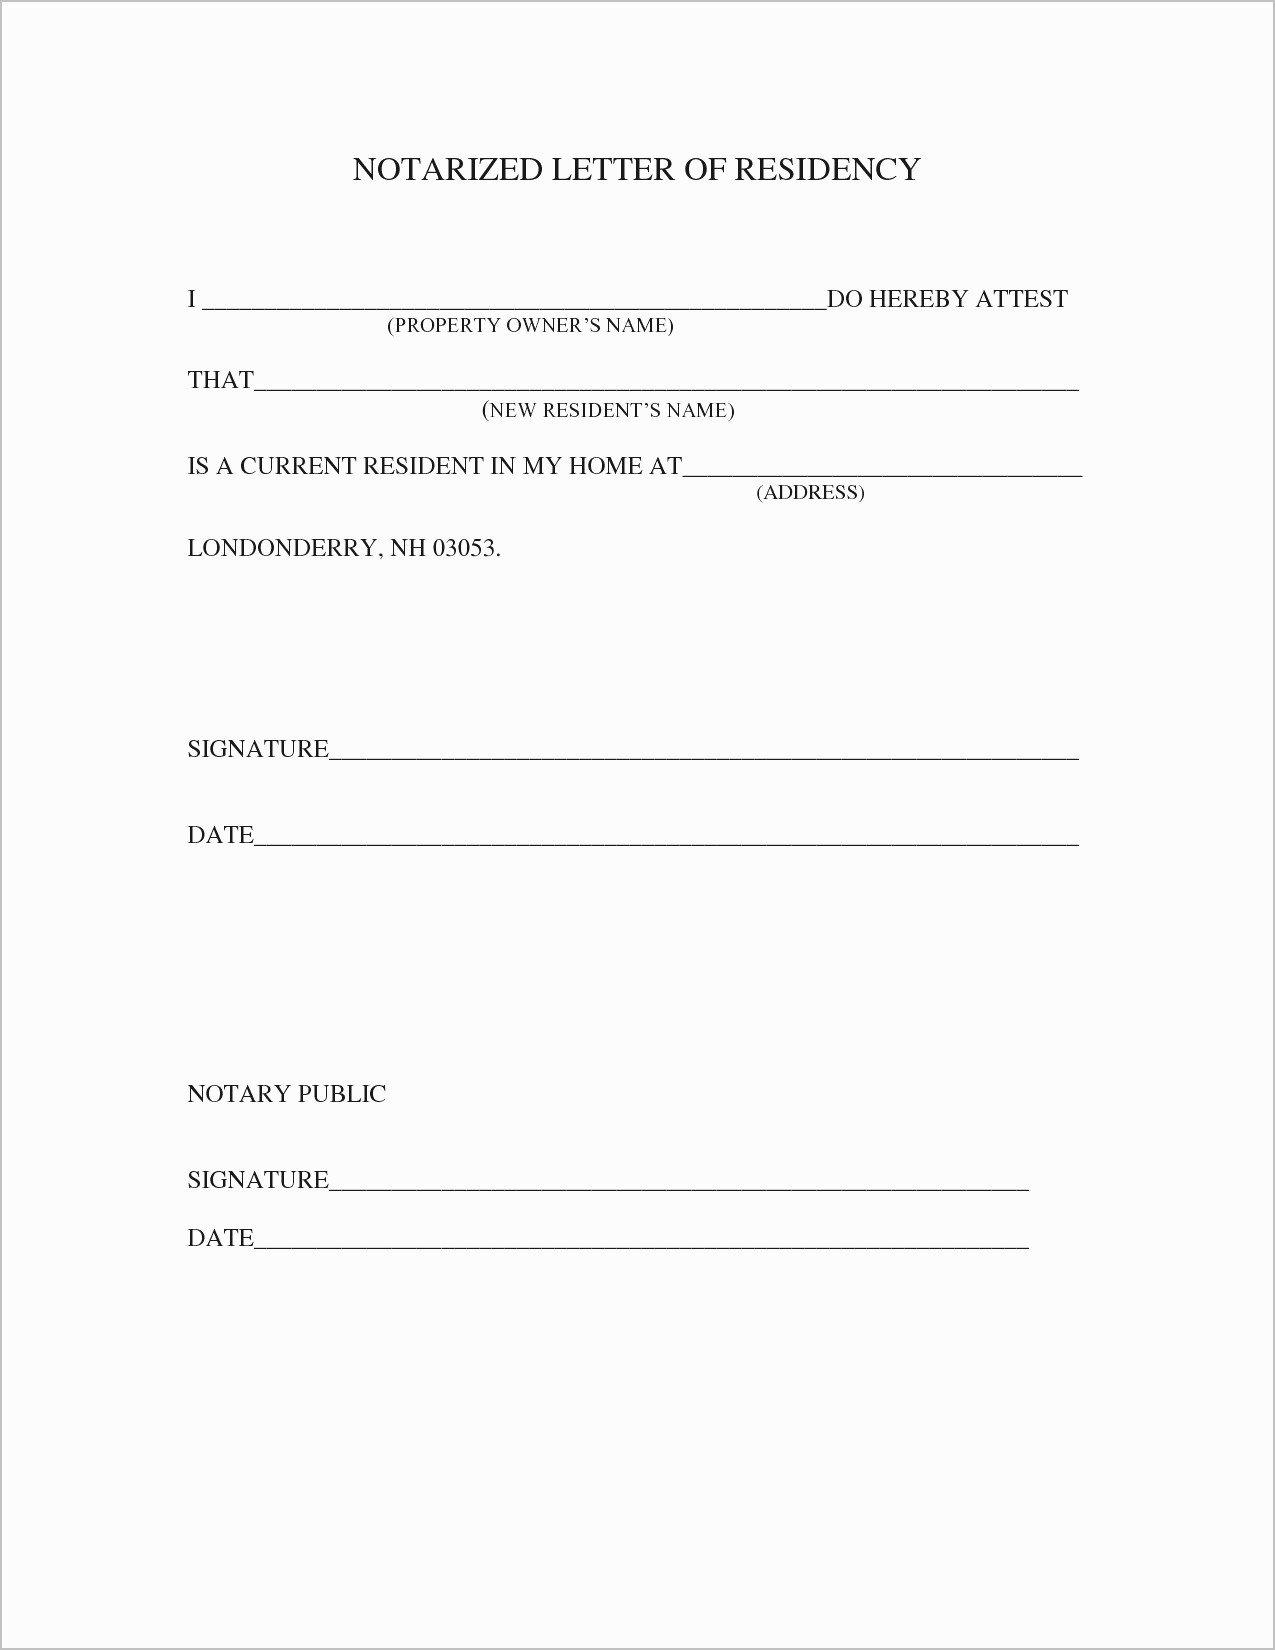 Printable Notarized Letter Of Residency Template Beautiful Proof Residency Letter Notarized Template Samples